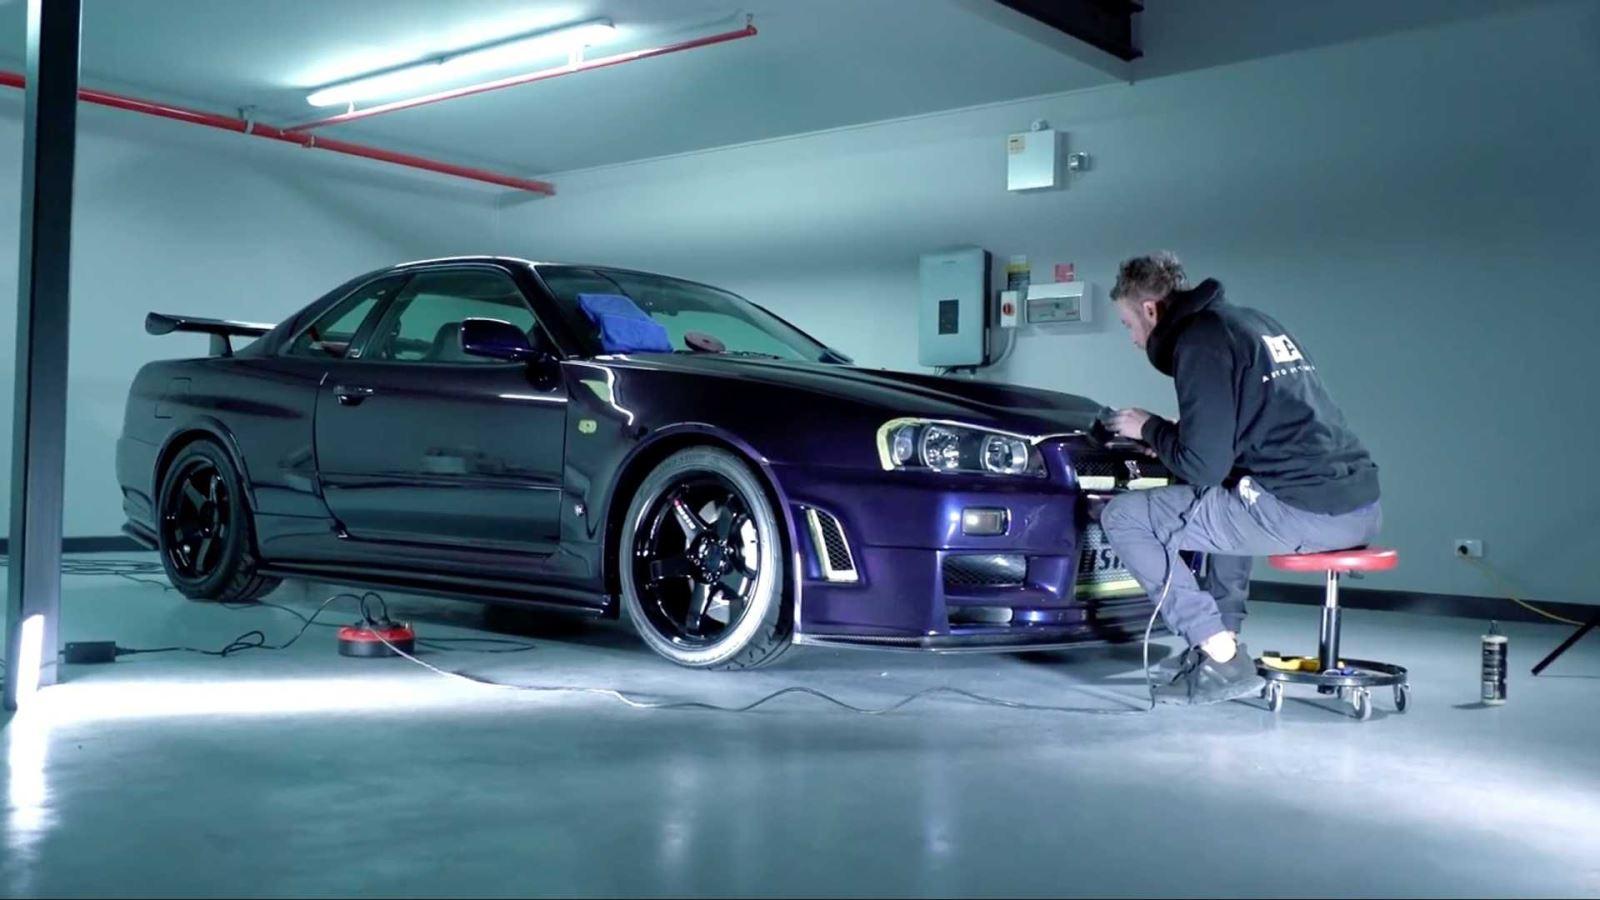 Video R34 Nissan GTR